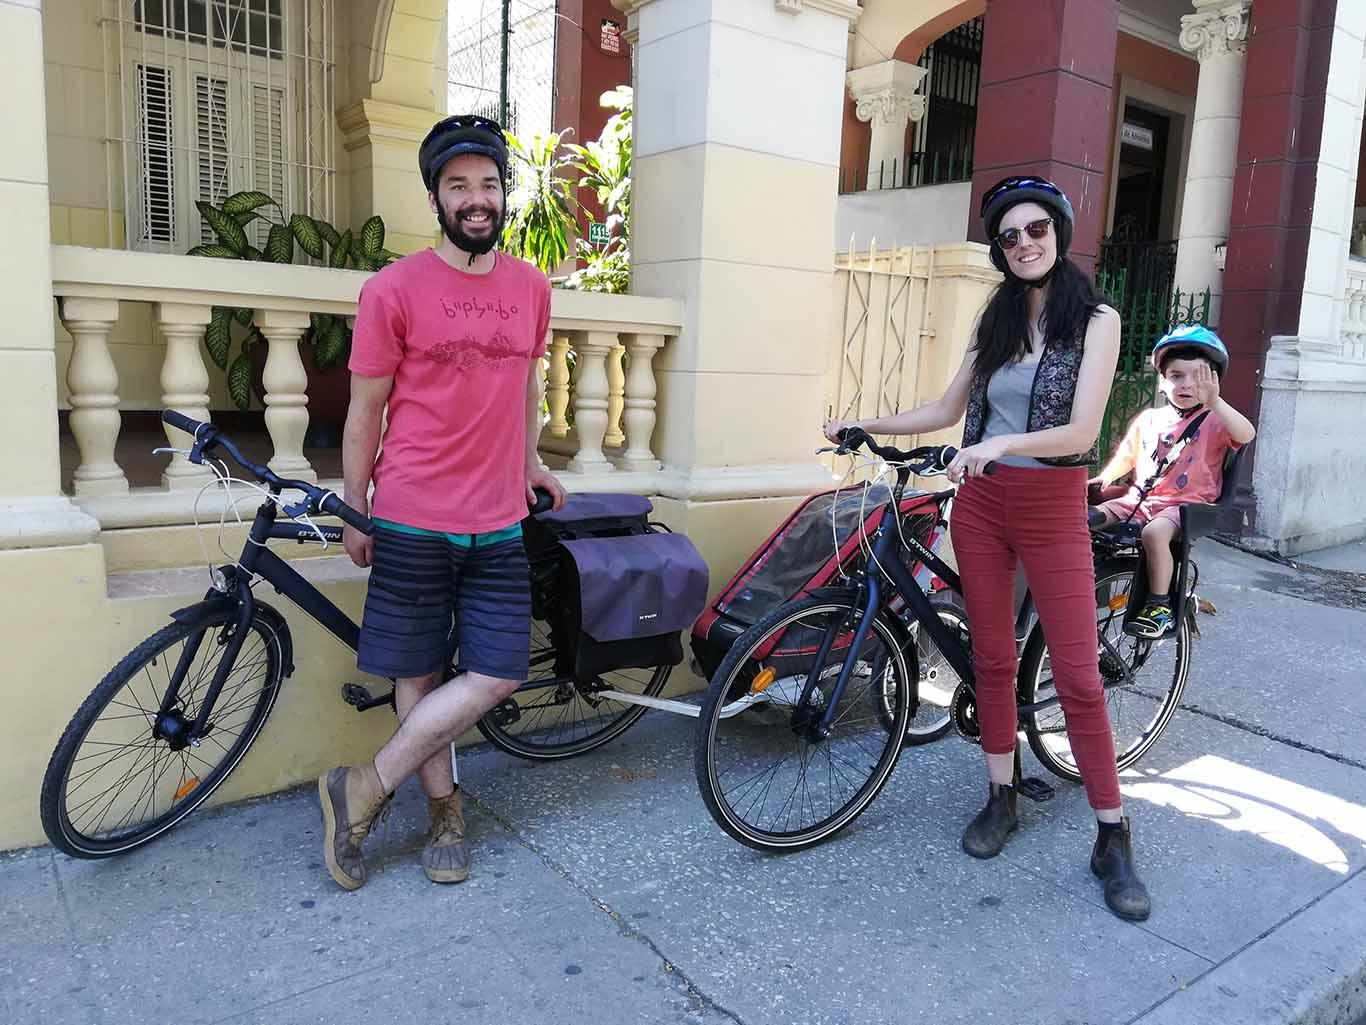 paseo en bici en familia